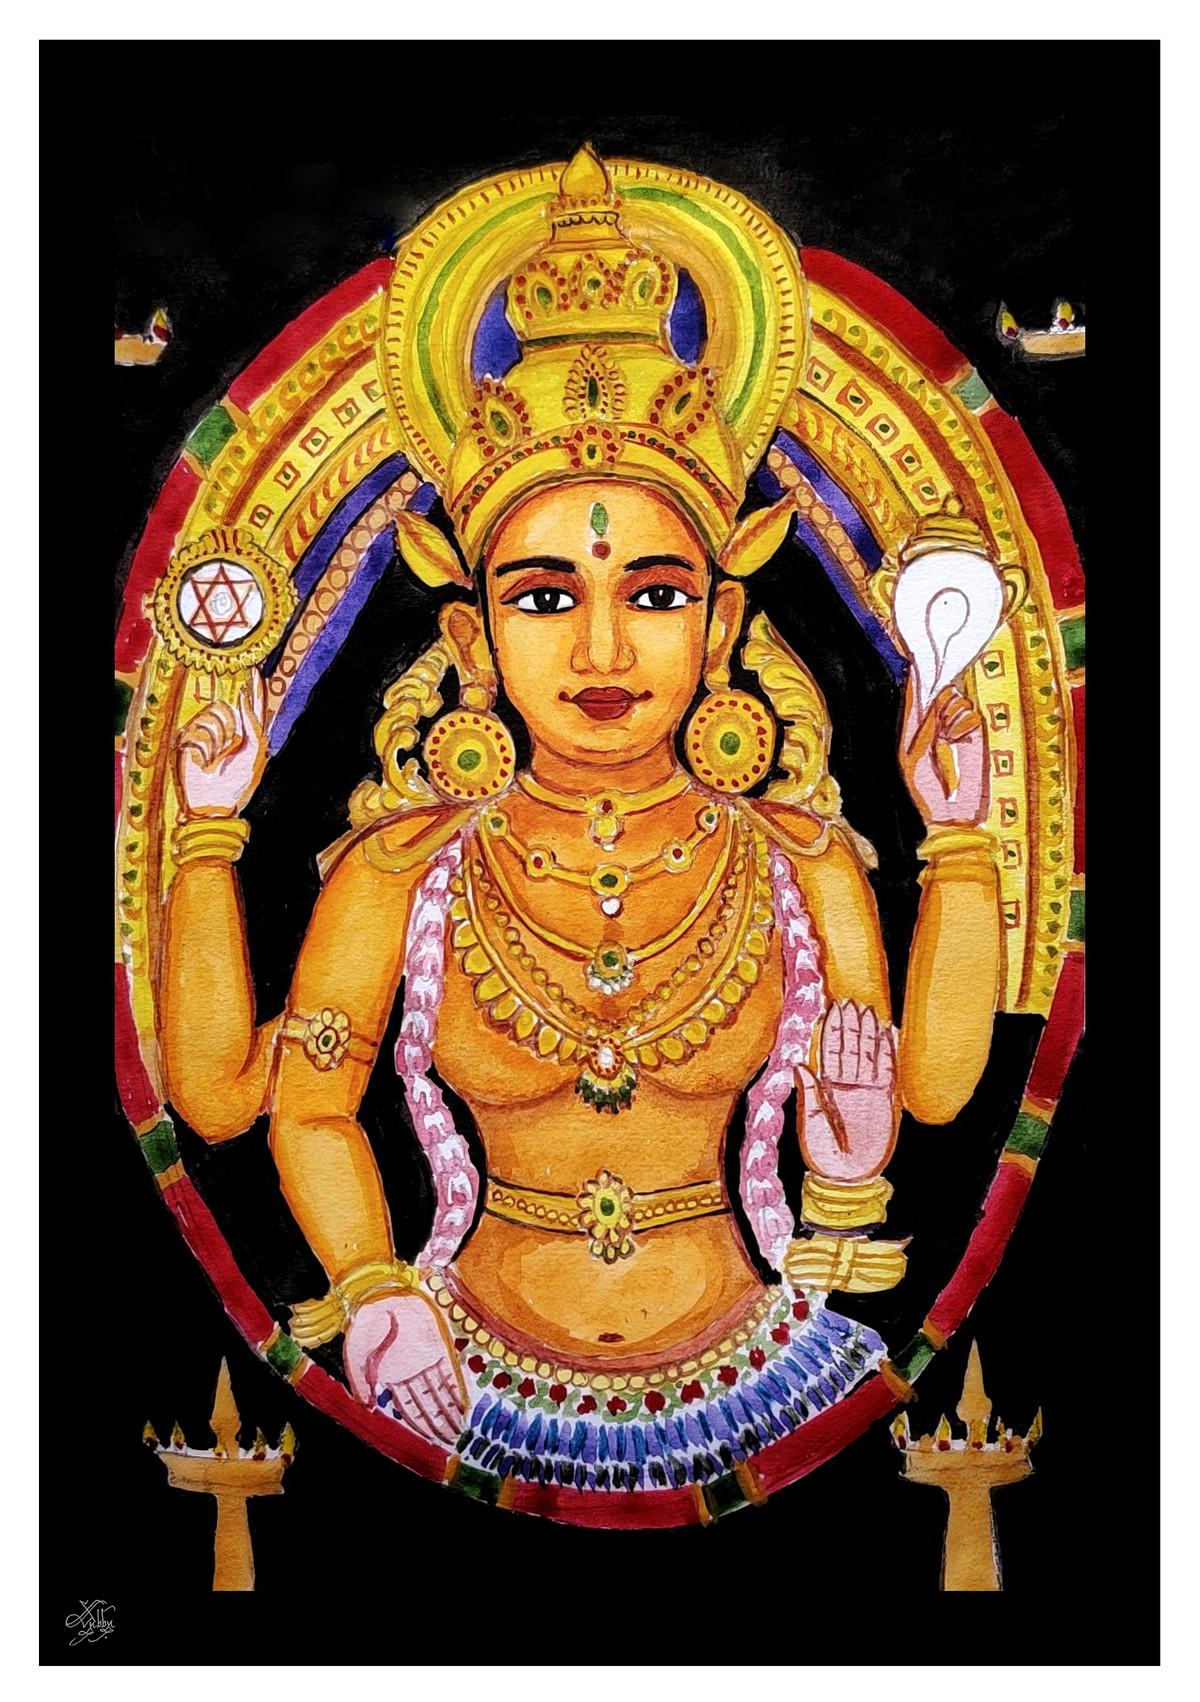 Chottanikkara Amma by Subbaraman Nurani, Traditional Painting, Watercolor on Paper, Di Serria color